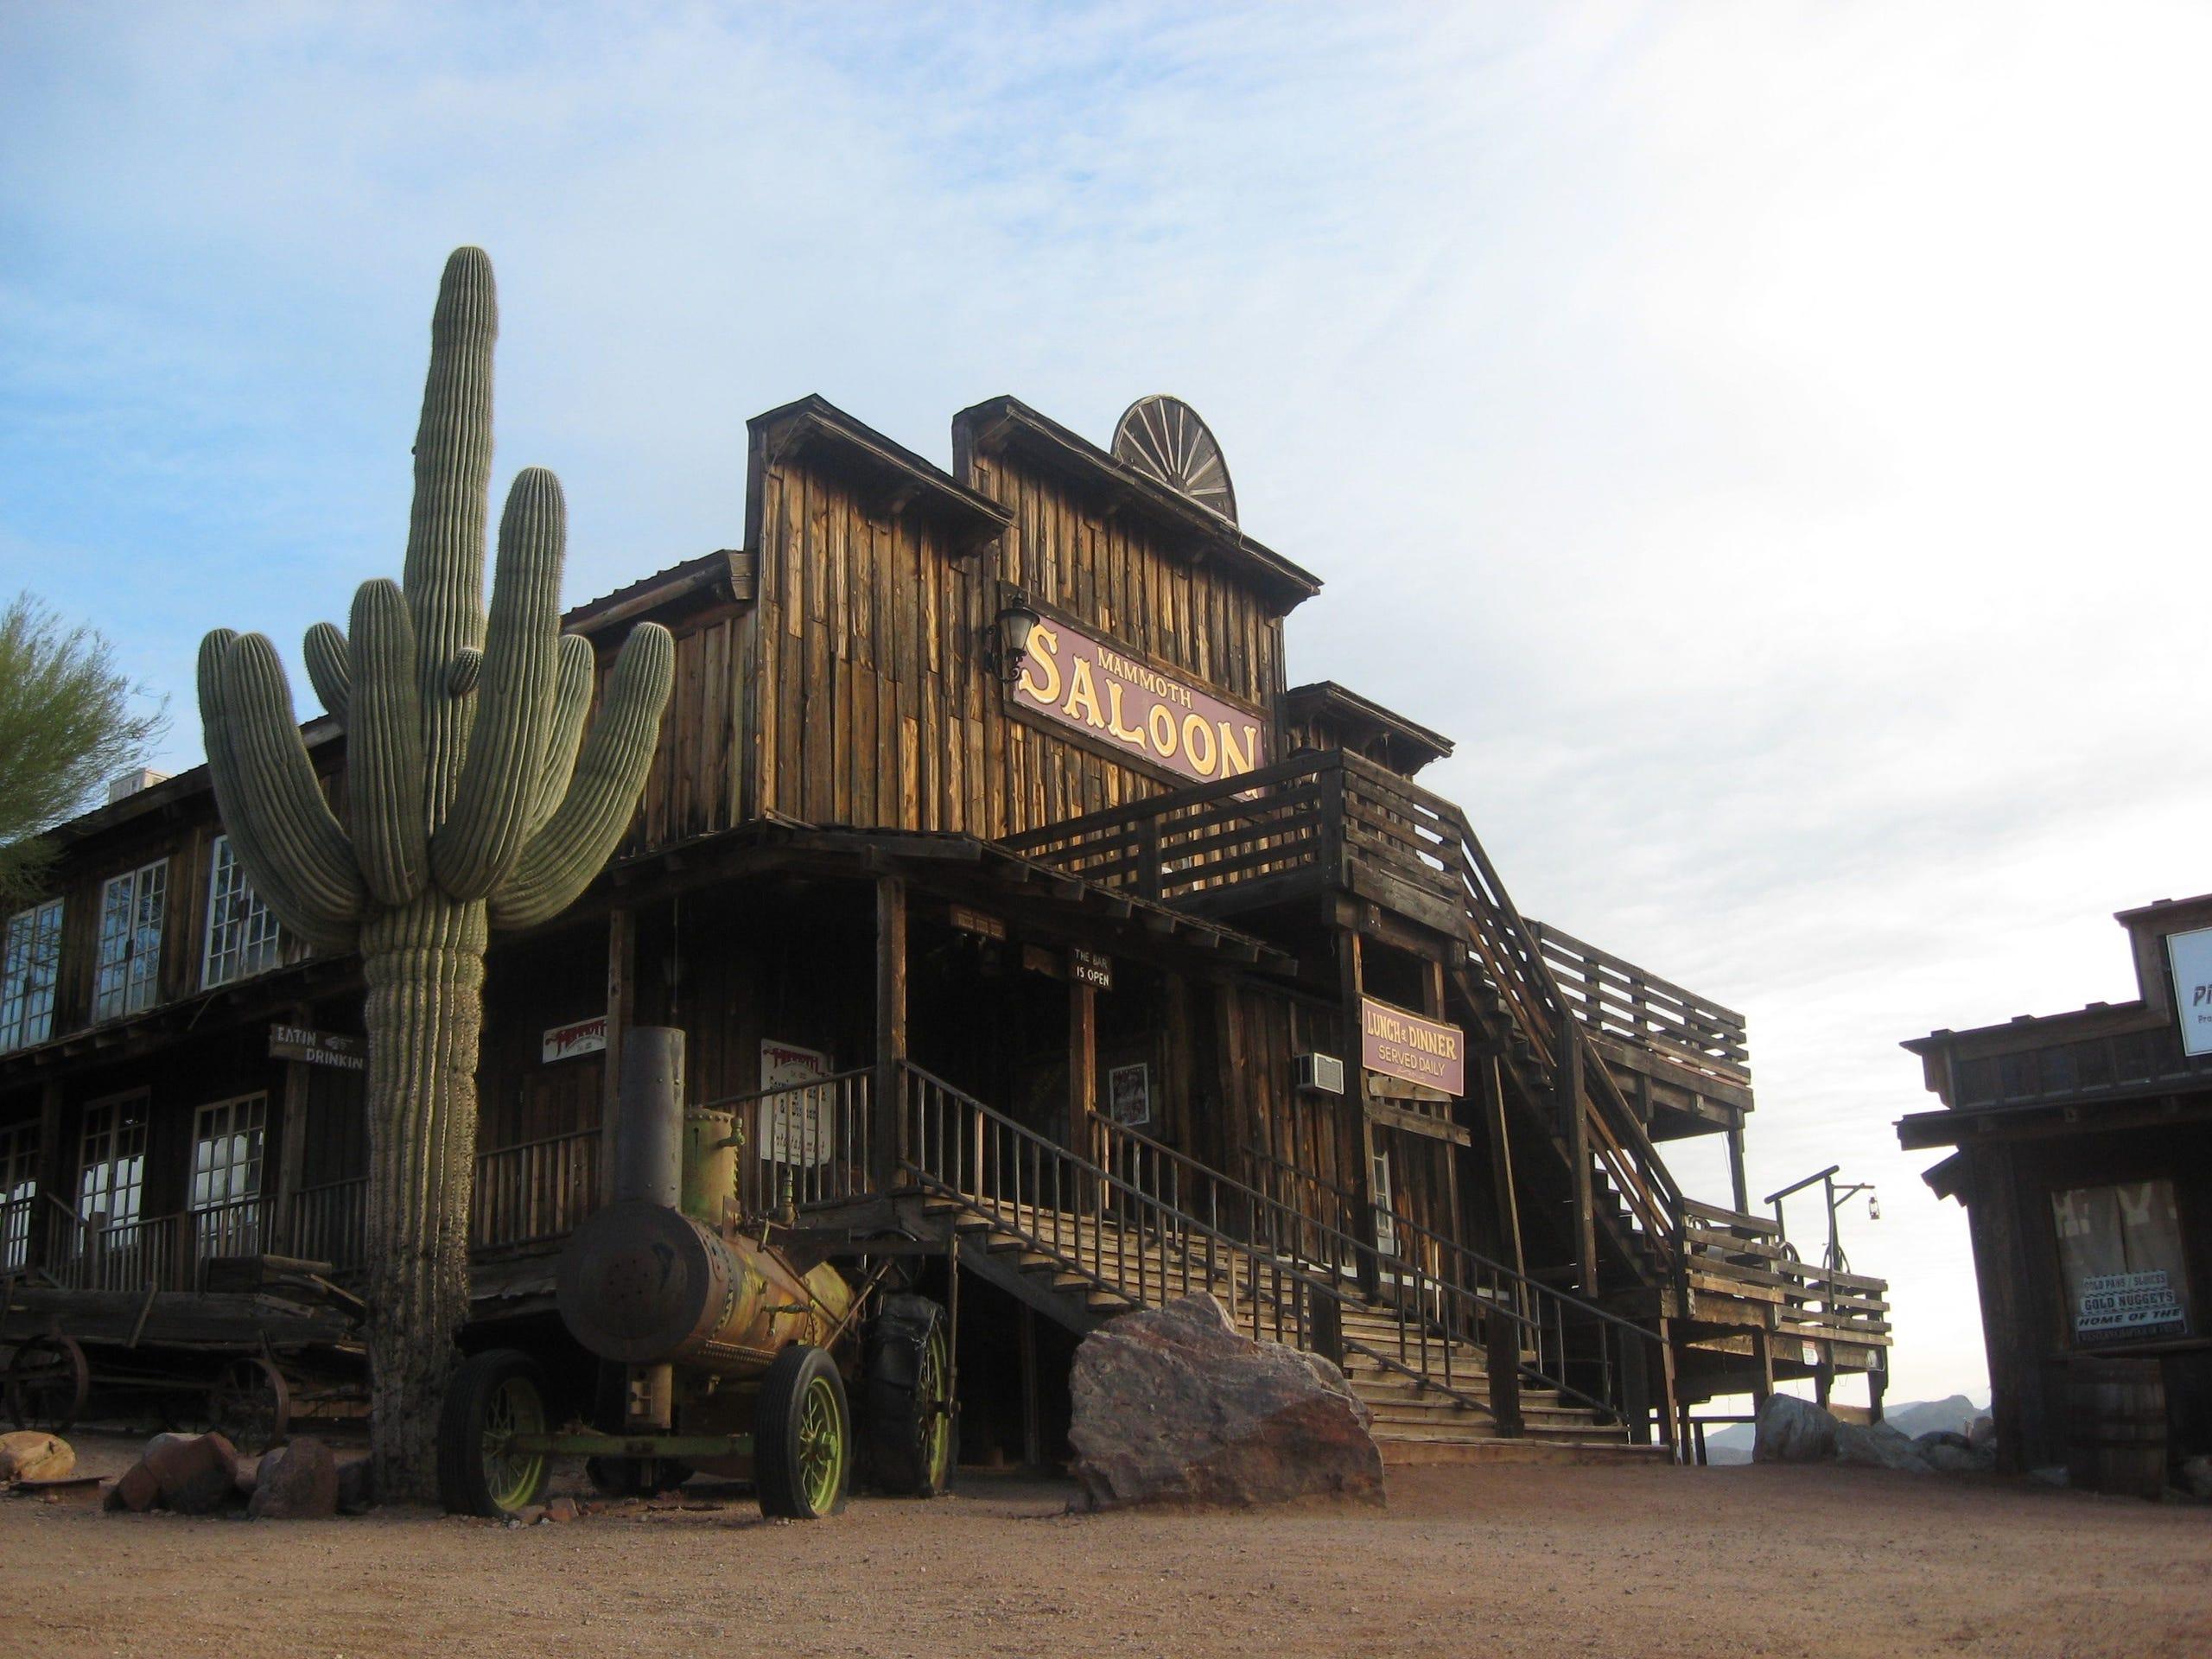 Arizona history photos: Mining and ghost towns